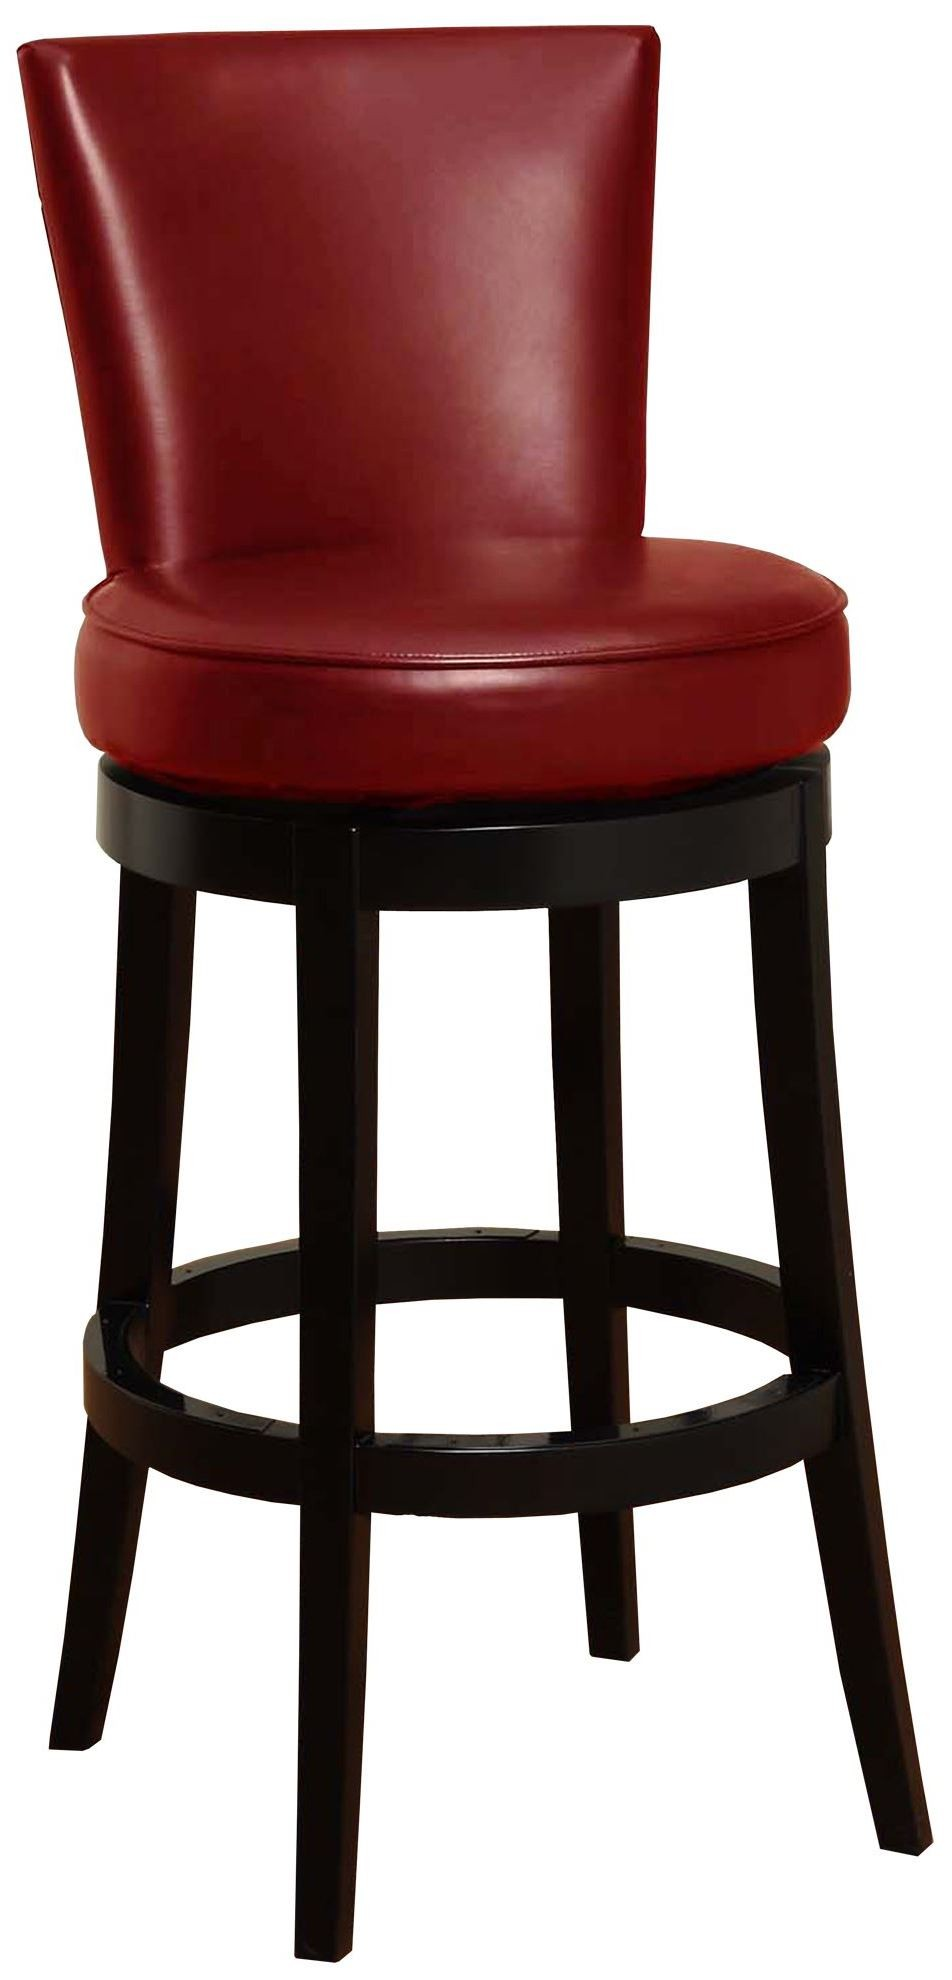 Boston 26 Red Bonded Leather Swivel Barstool From Armen